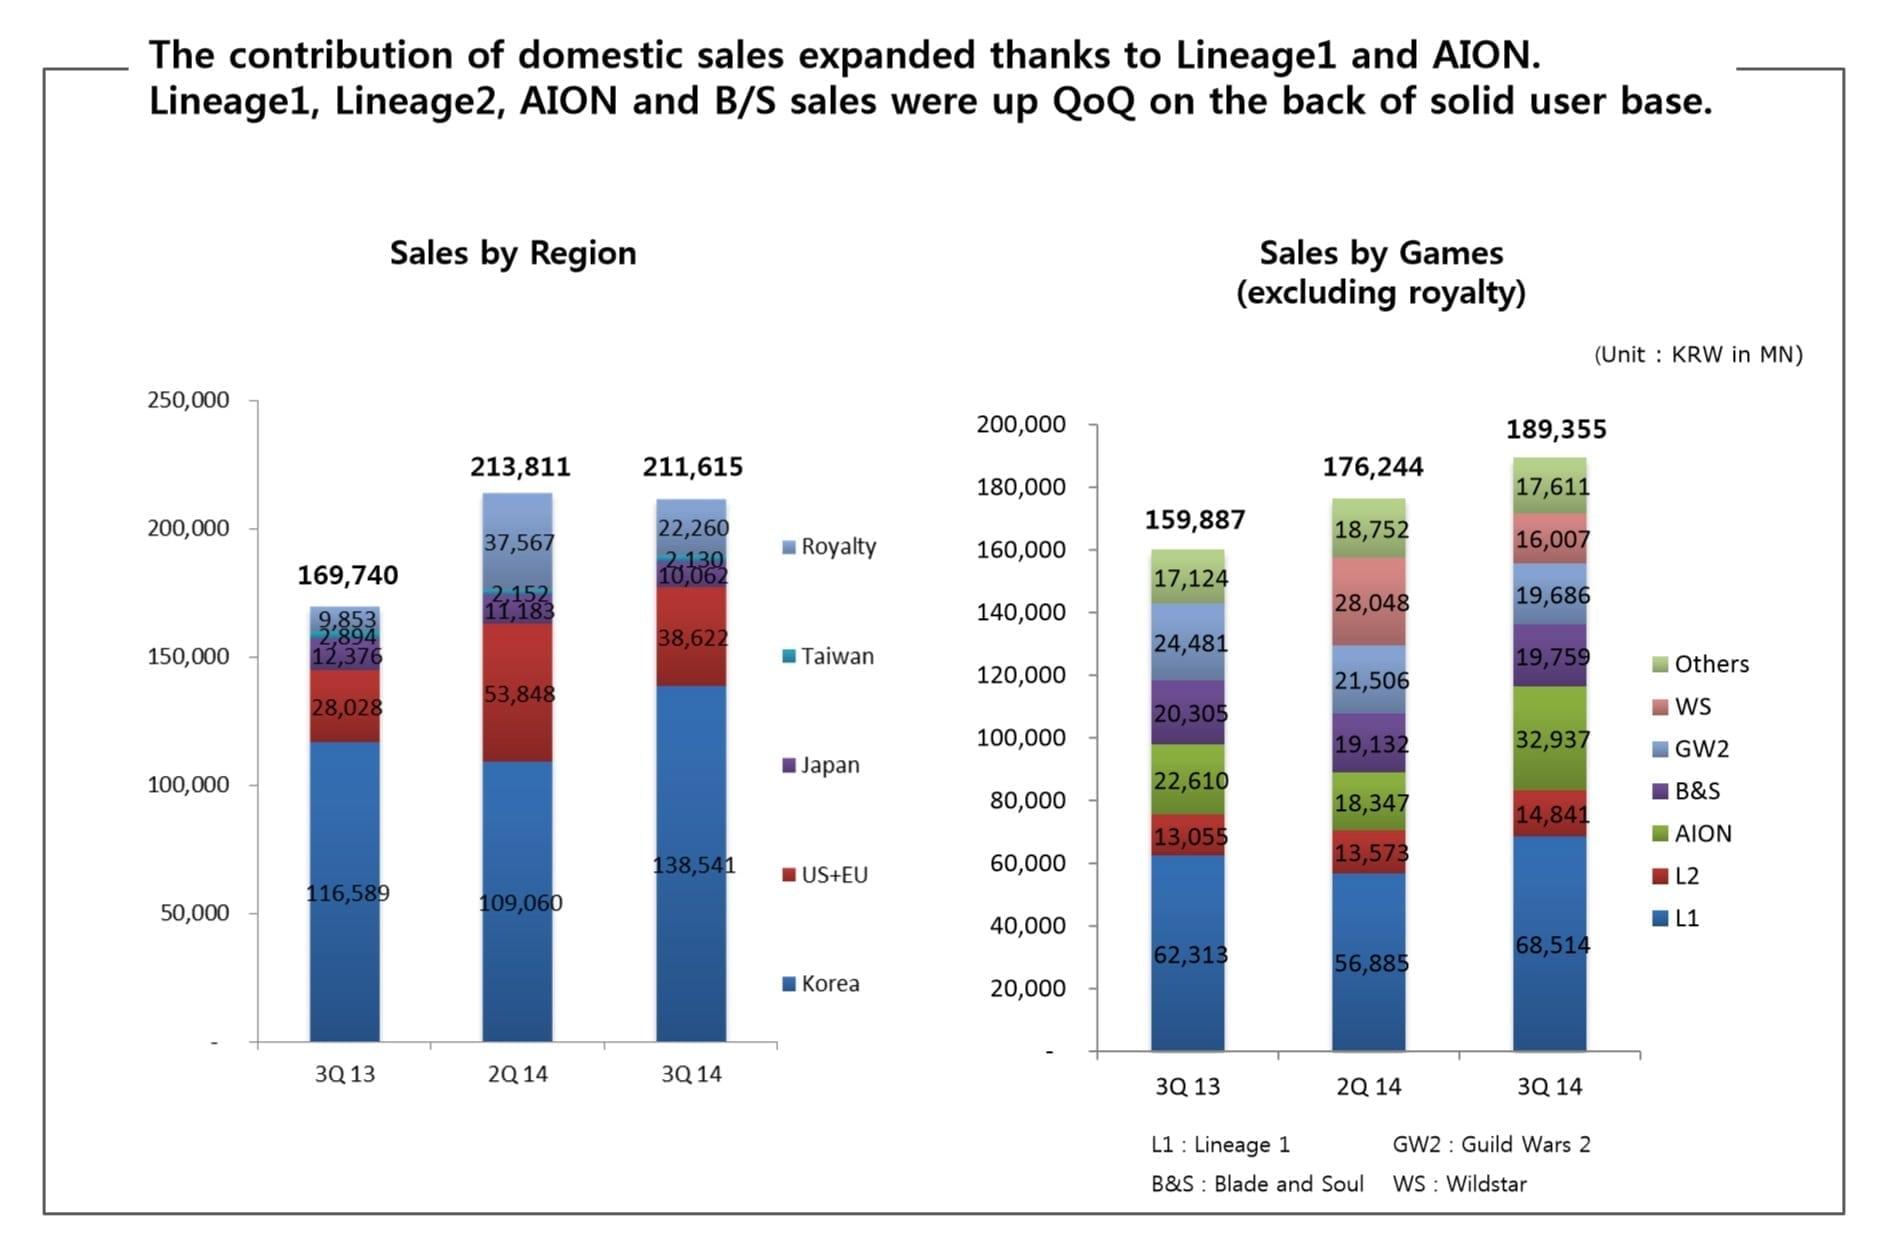 NCsoft 3Q 2014 sales